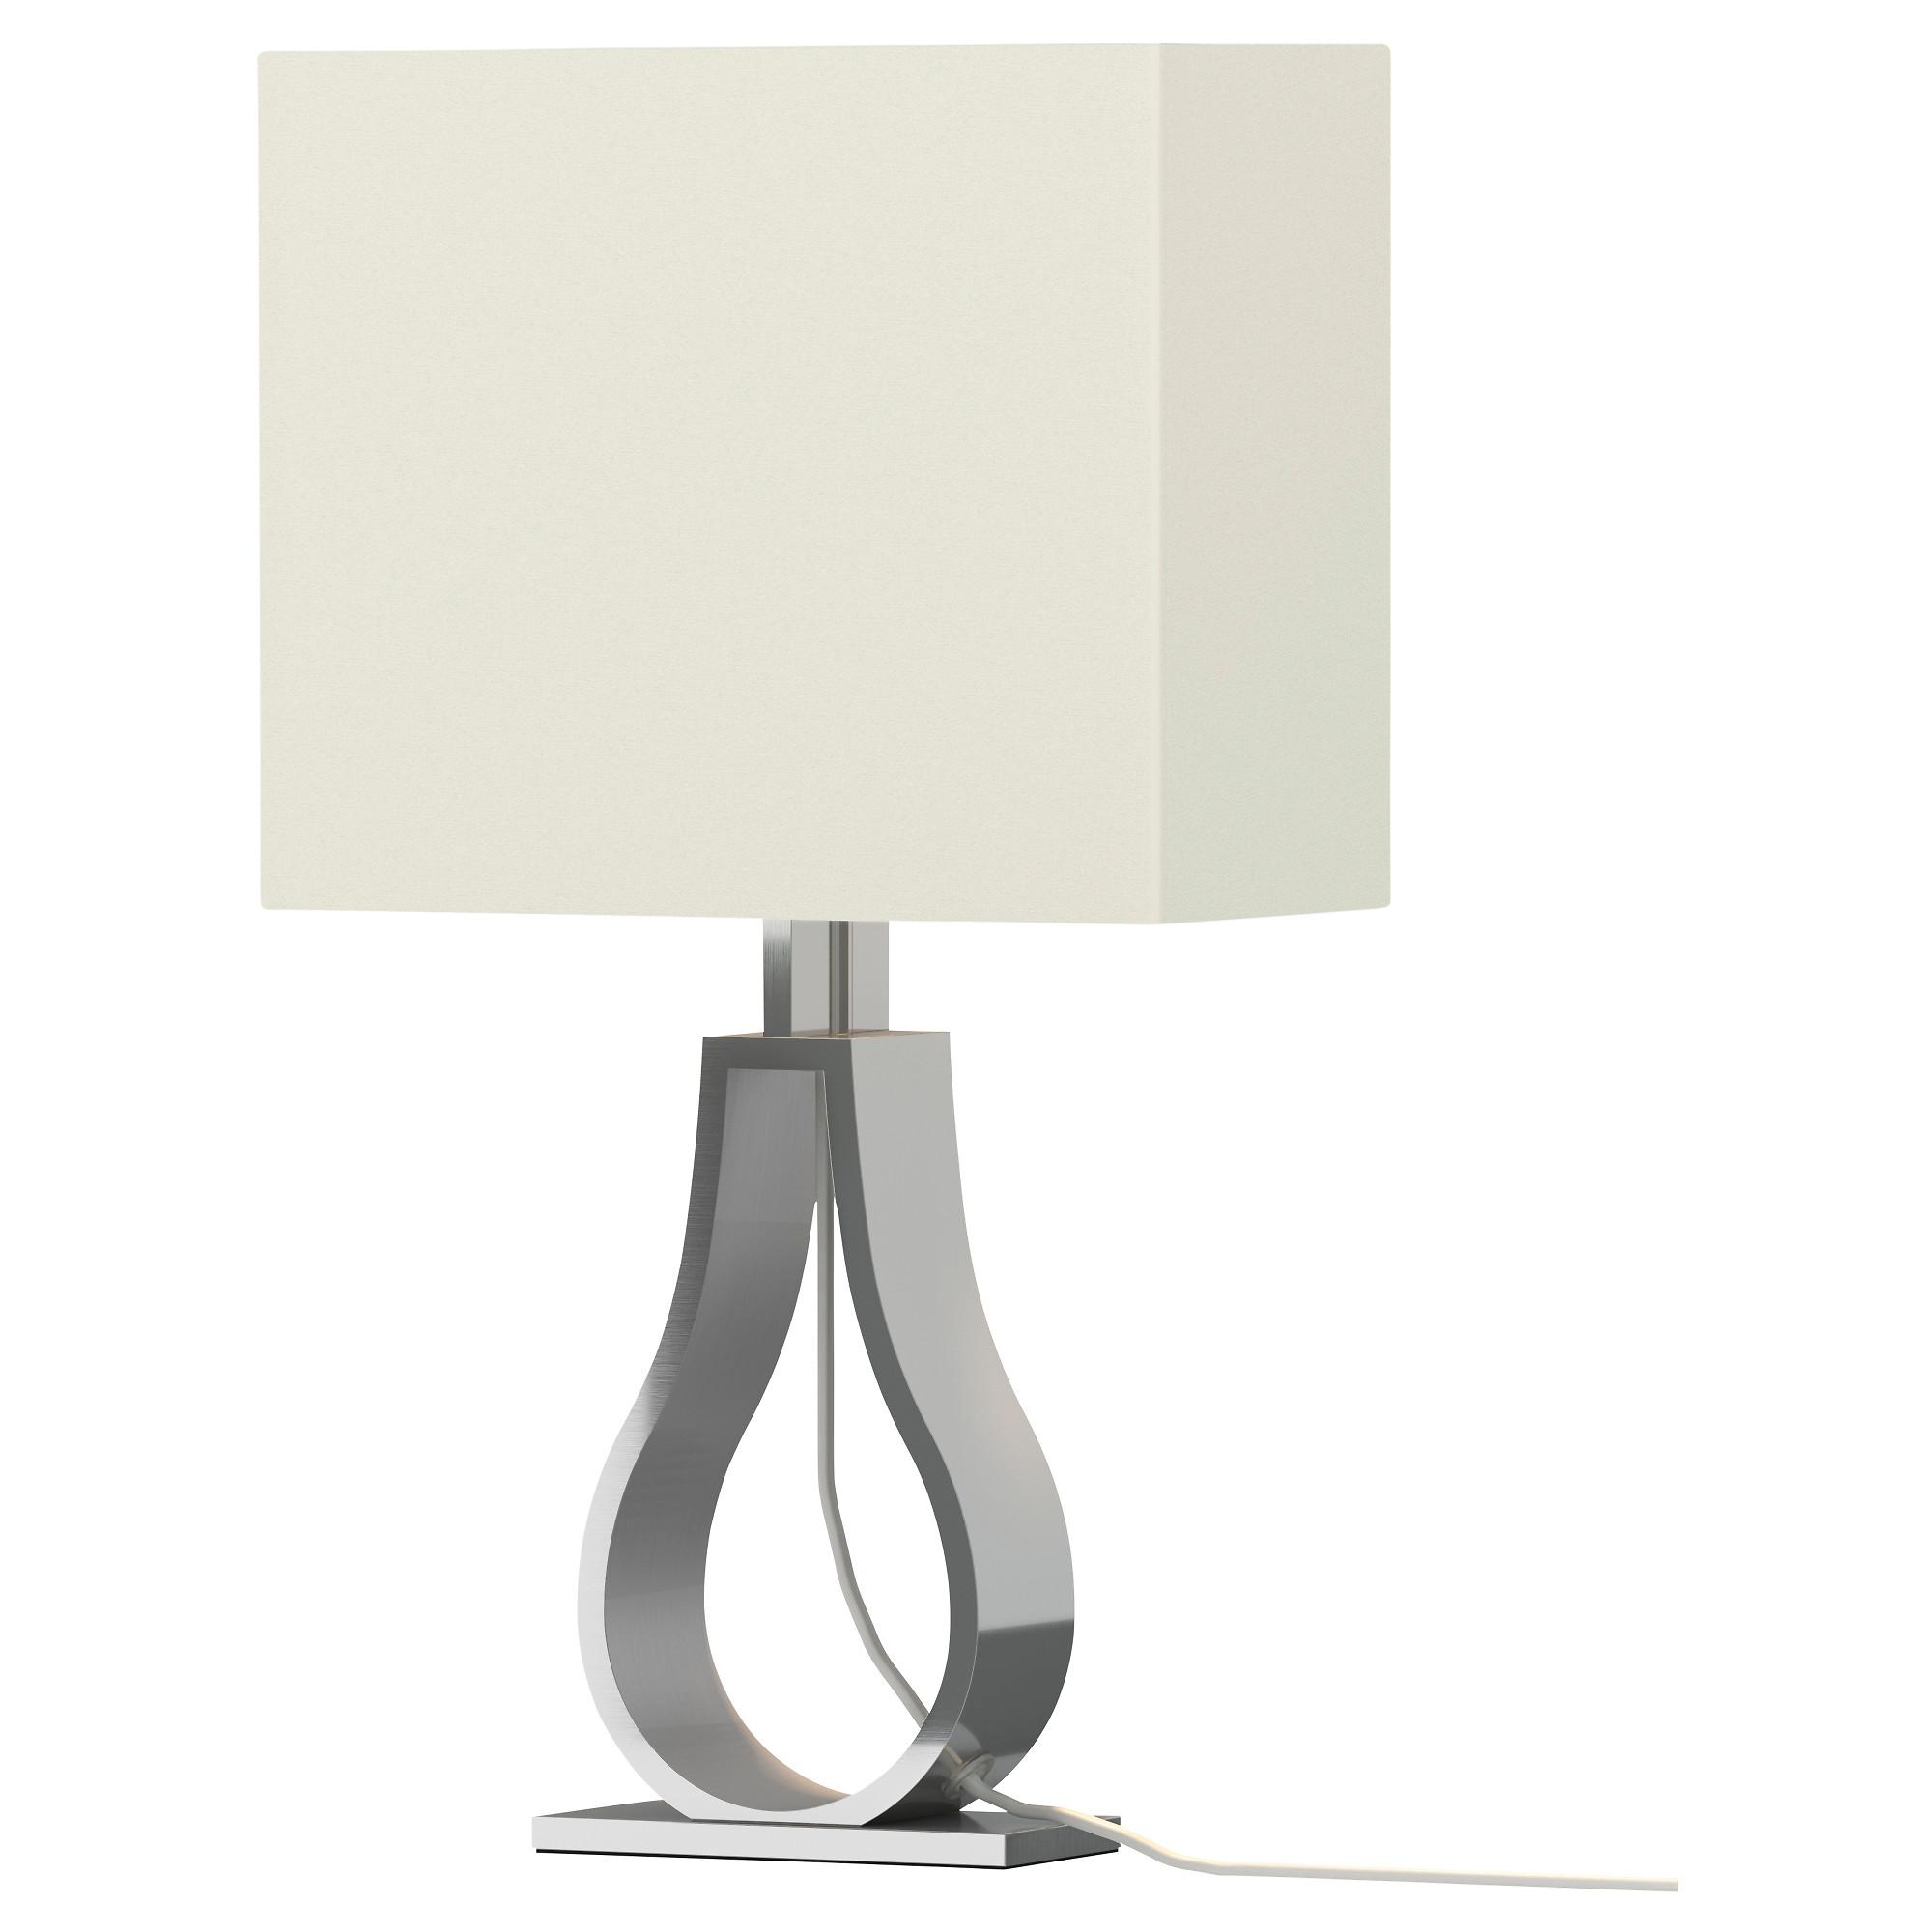 table lamps klabb table lamp - ikea AEOUMMO